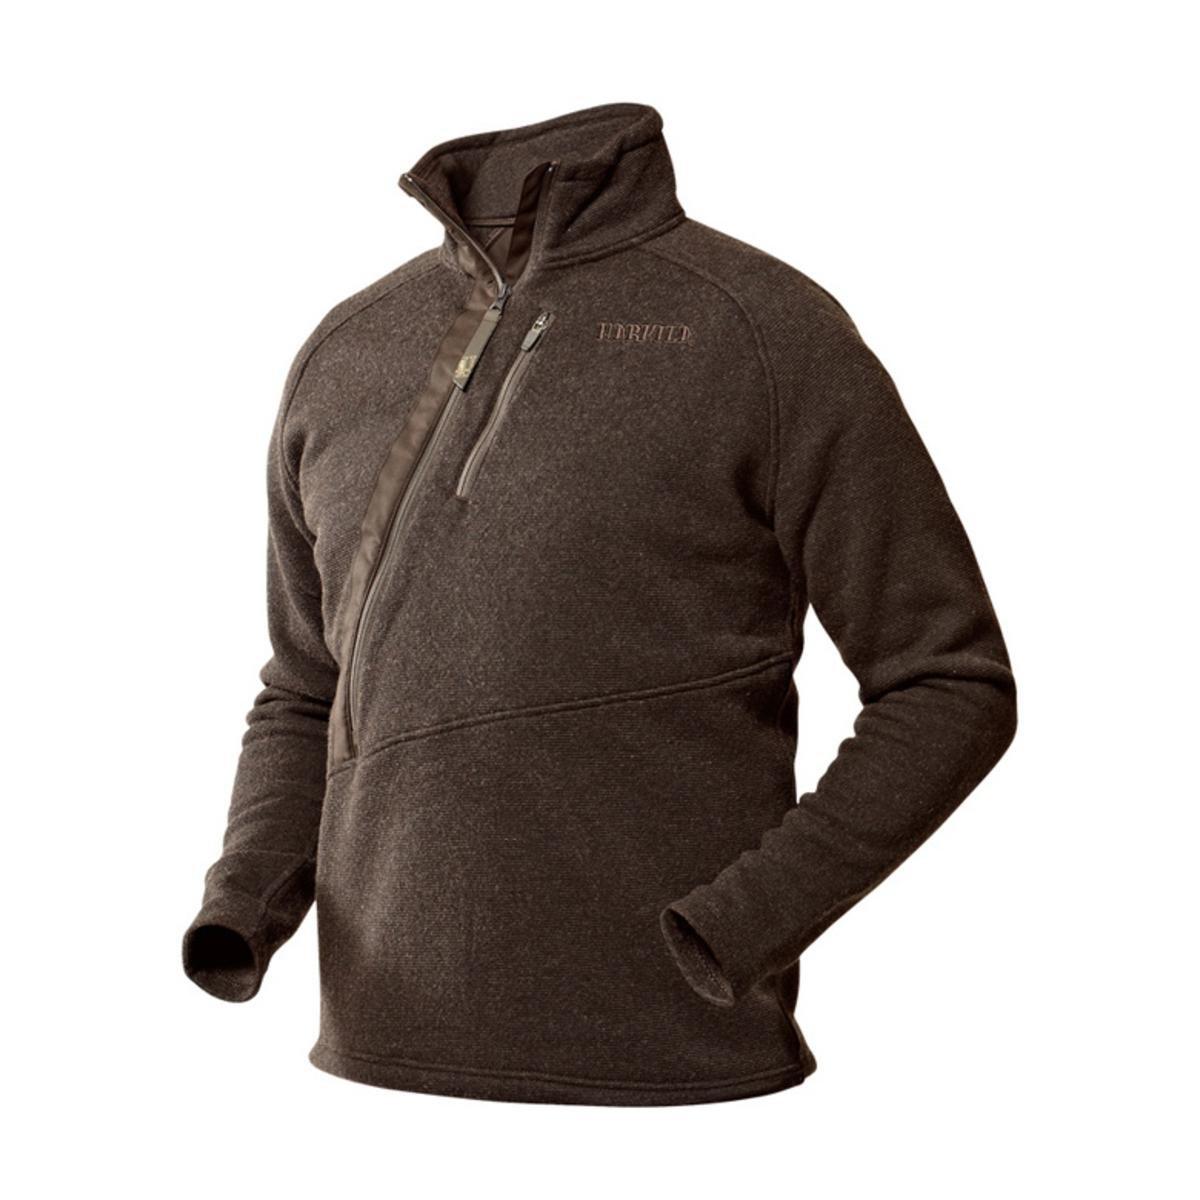 Härkila Nite sweater, brown 150102444